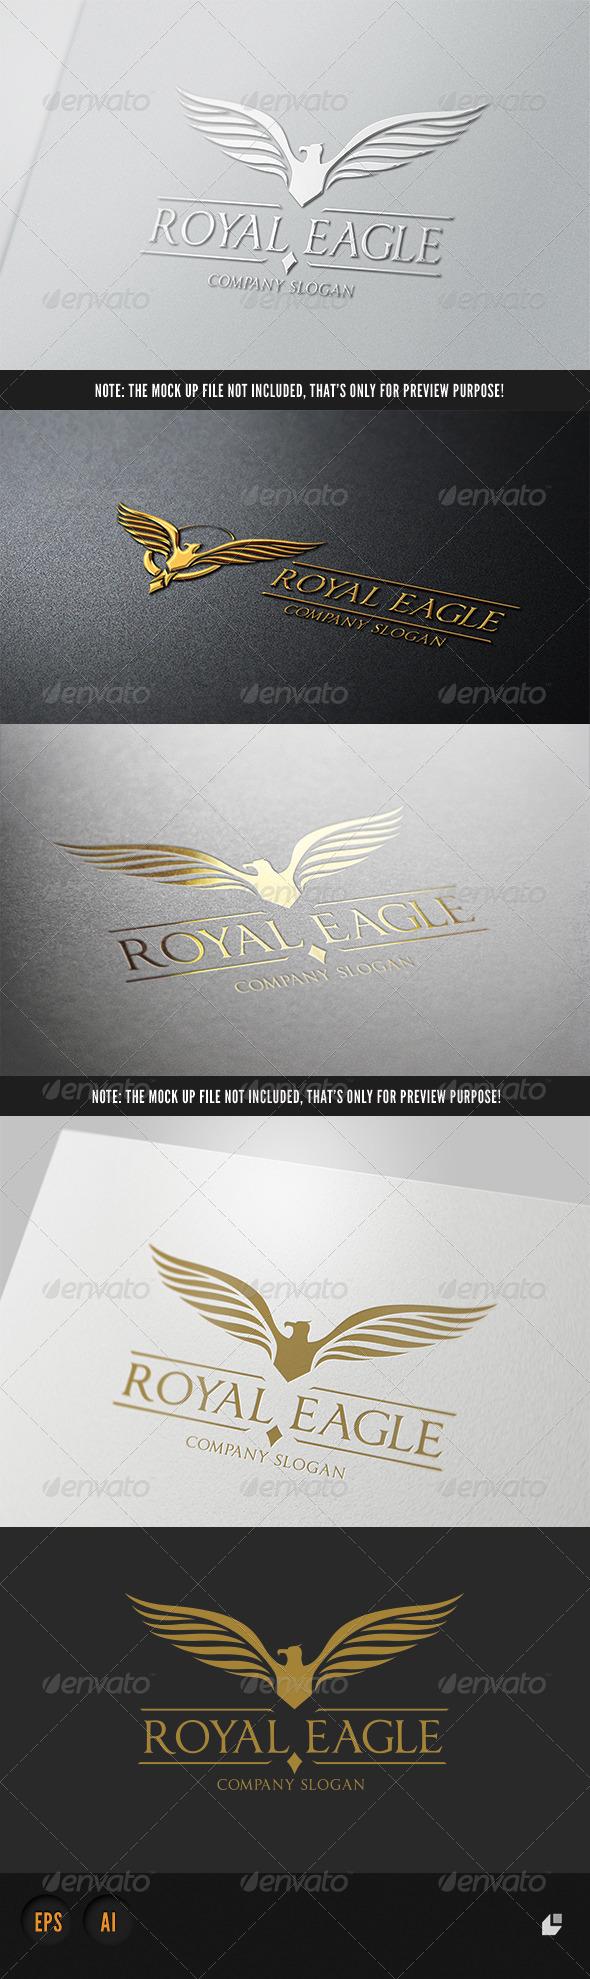 GraphicRiver Royal Eagle Logo II 5312561